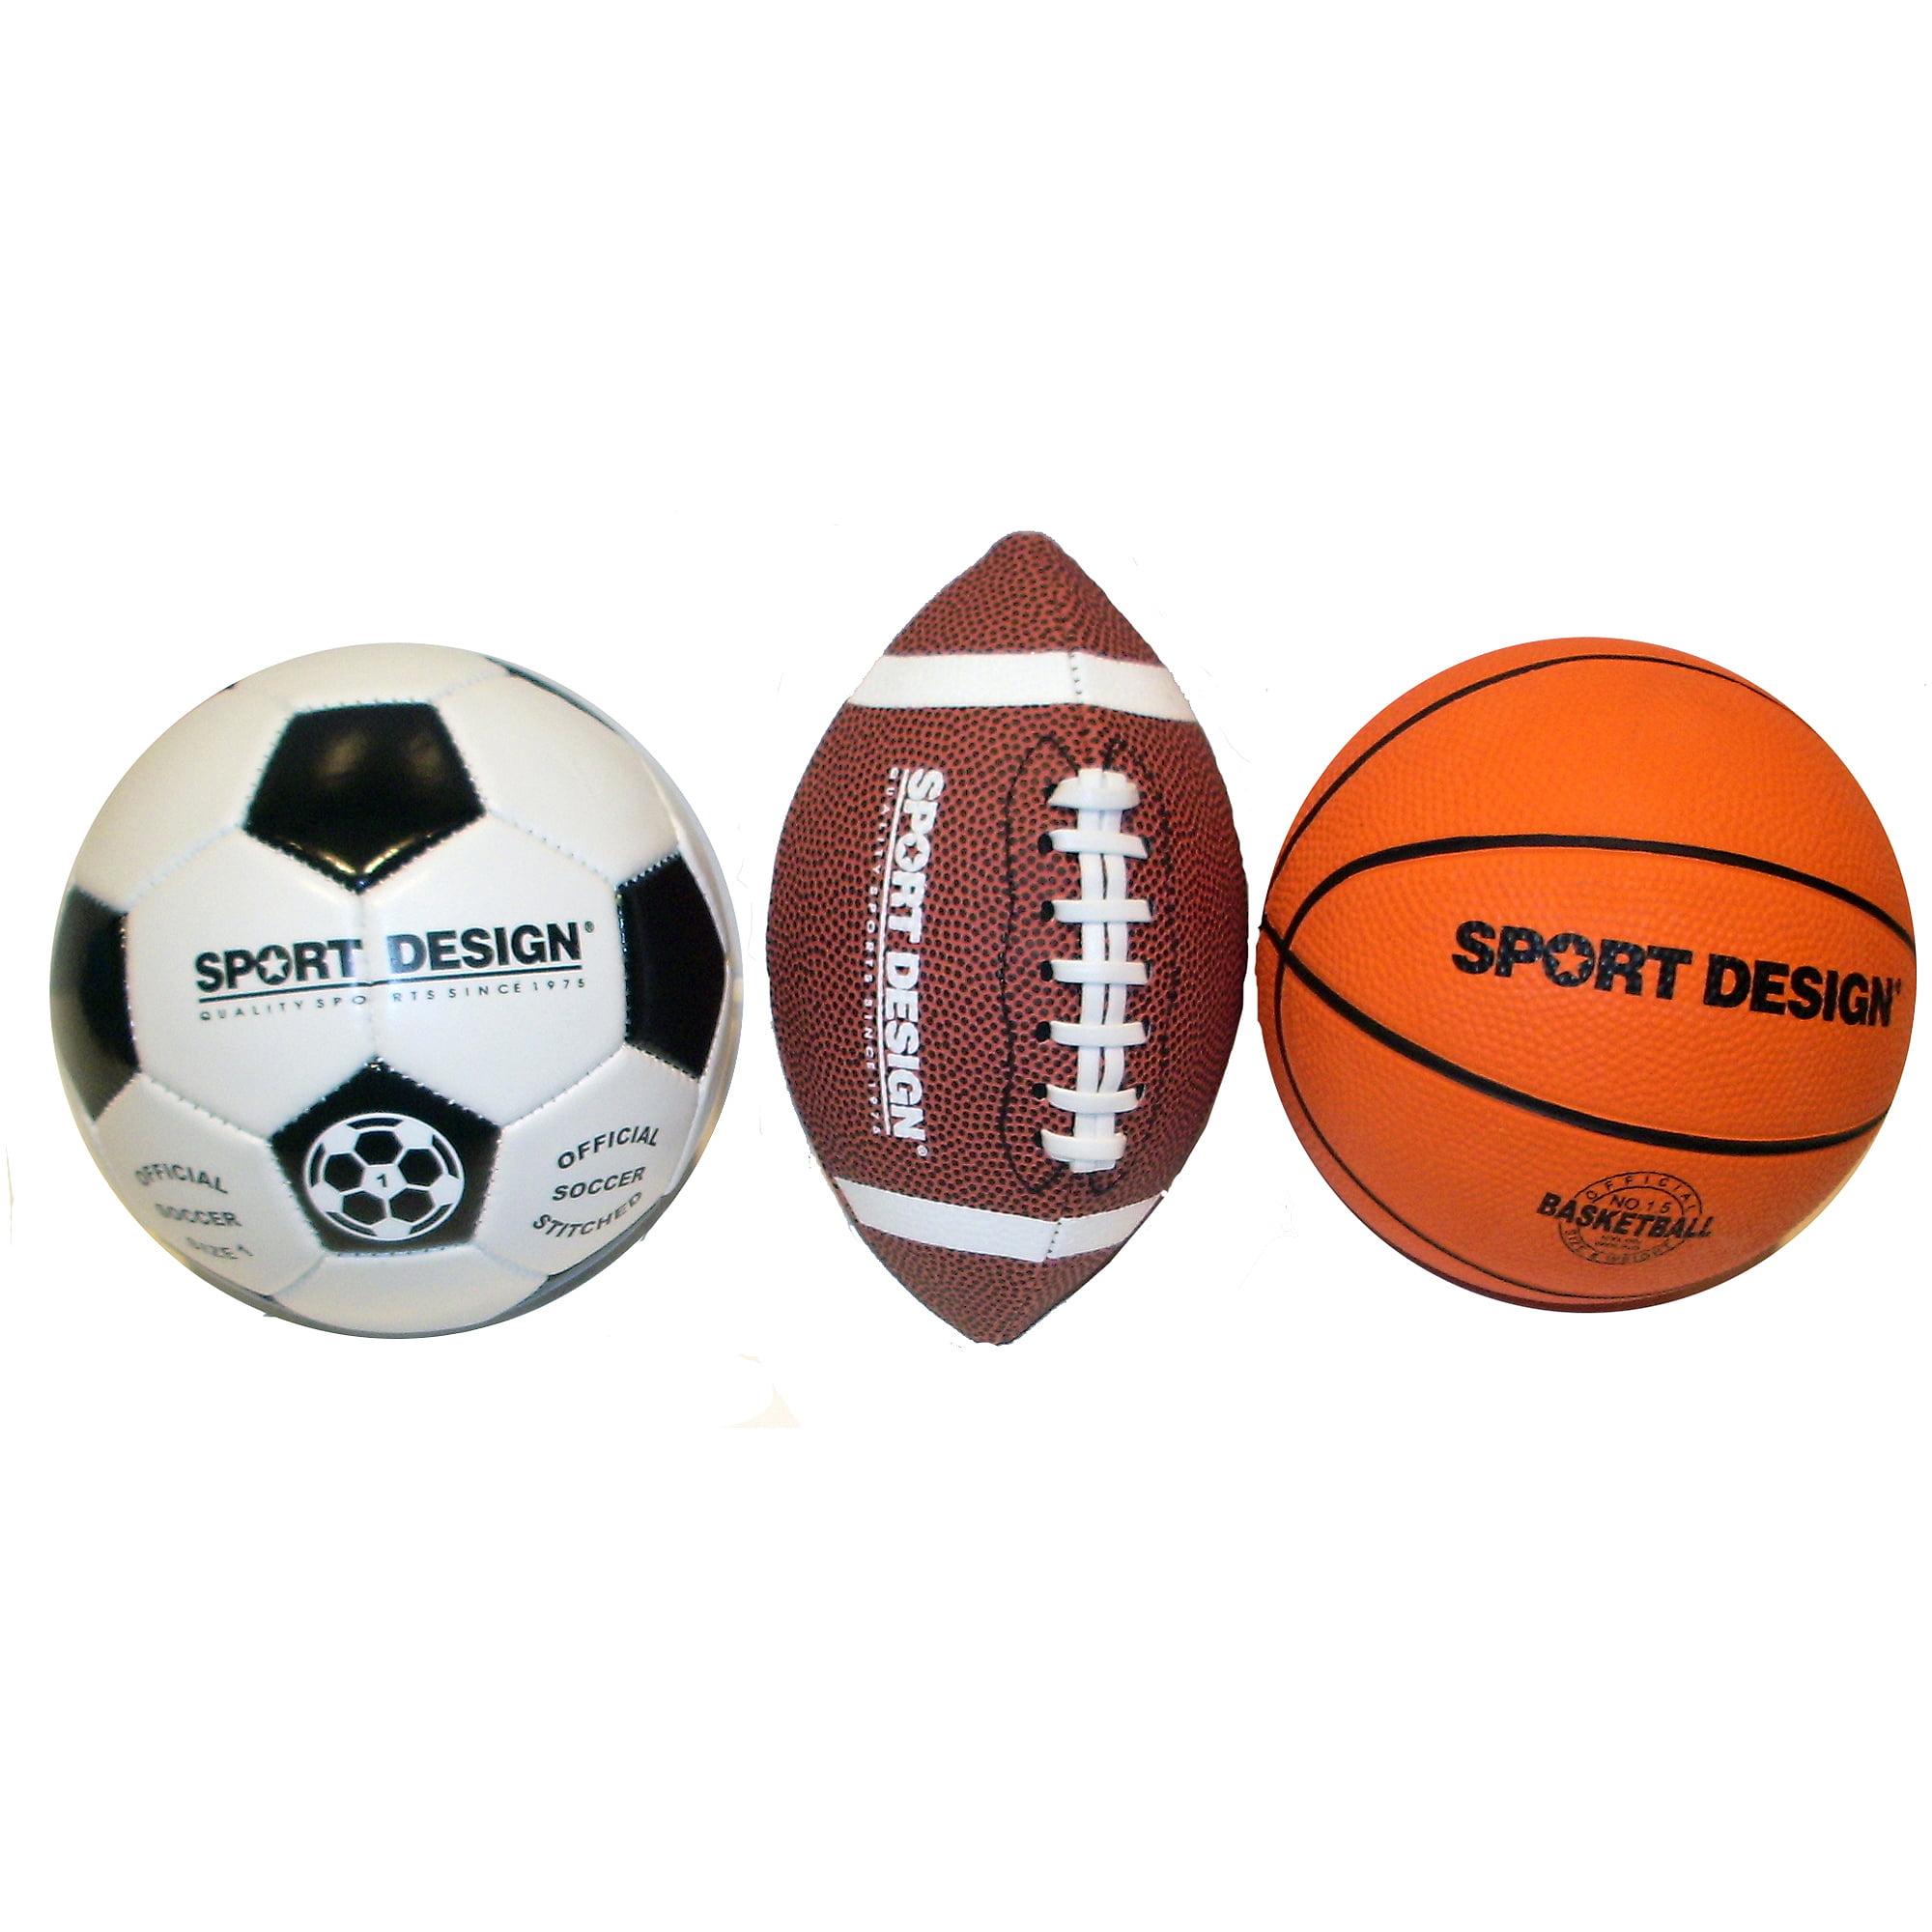 Sport Design Mini Ball Set, Soccer, Football and Basketball ...